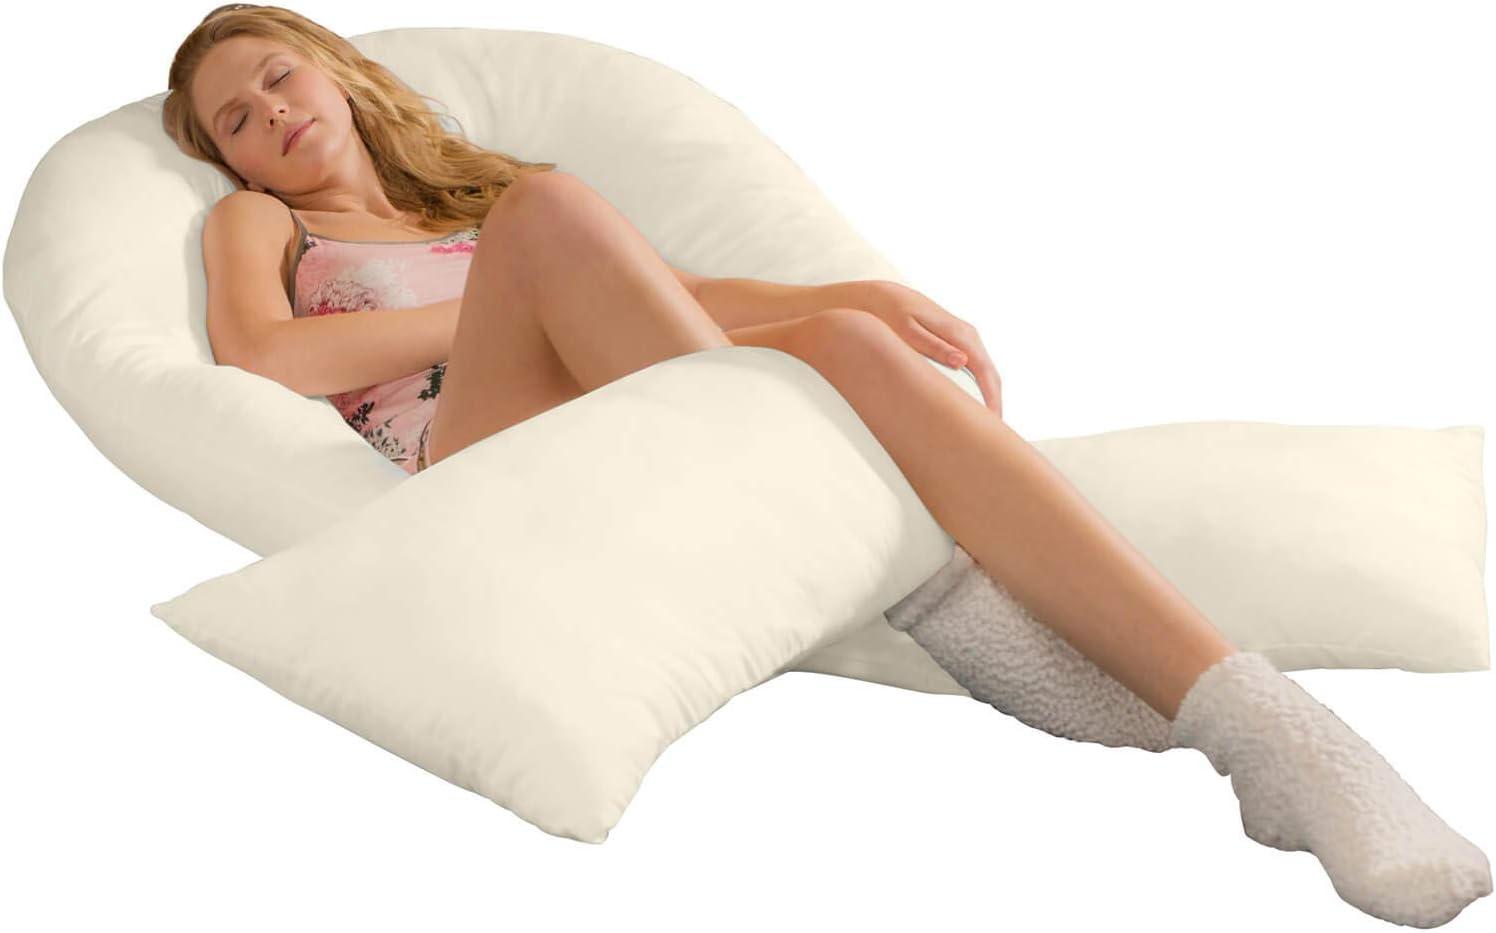 Traumreiter Jumbo XXL Seitenschl/äferkissen mit Bezug Natur I Schwangerschaftskissen U Form Full Body Pillow Seitenschl/äfer Kissen f/ür Schwangere Lagerungskissen